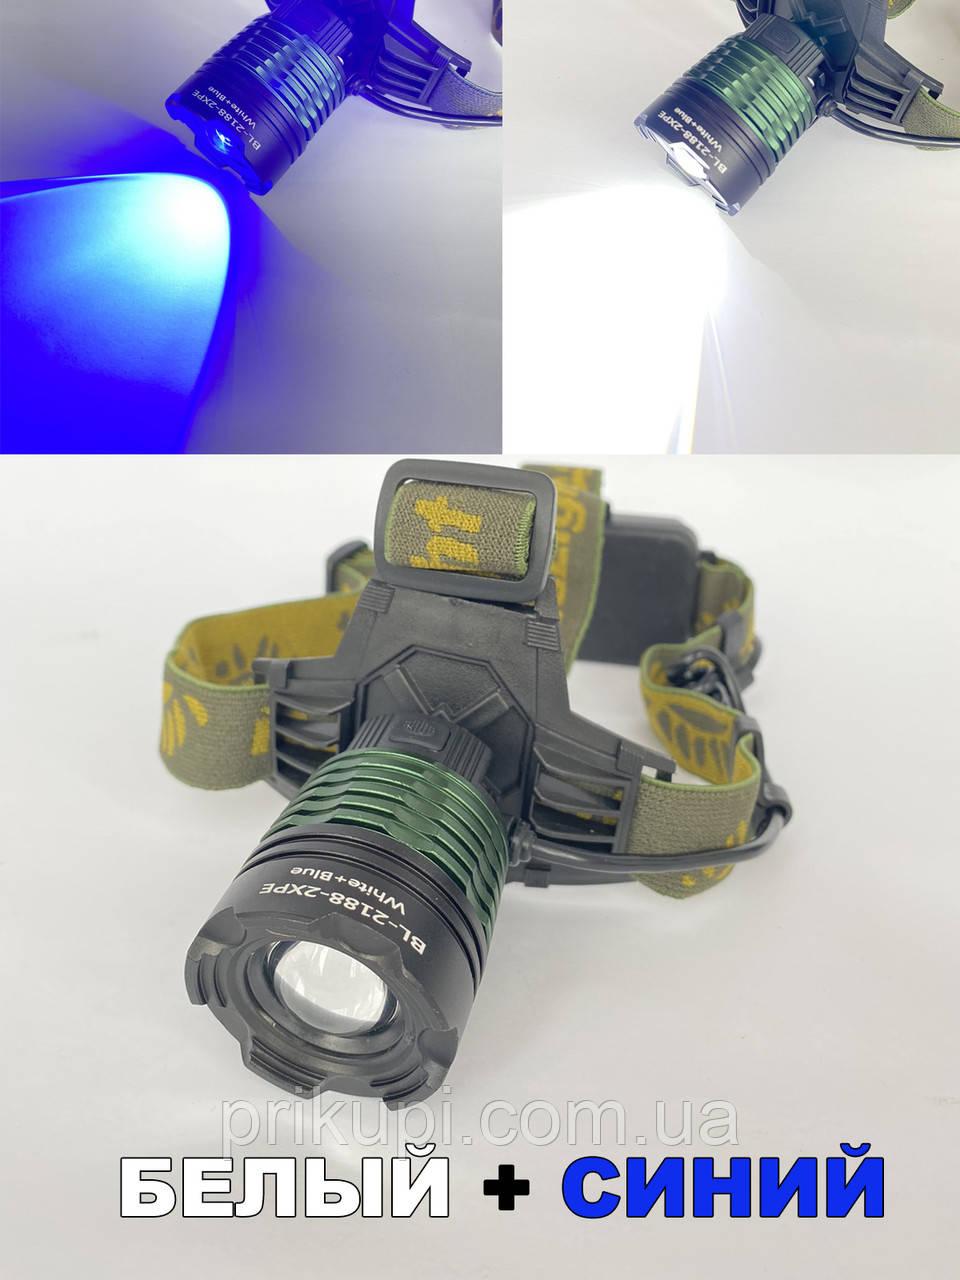 Налобный фонарь Police BL-2188 - 2XPE белый+синий, ZOOM, аккумуляторы 18650 х2, ЗУ 12-220В